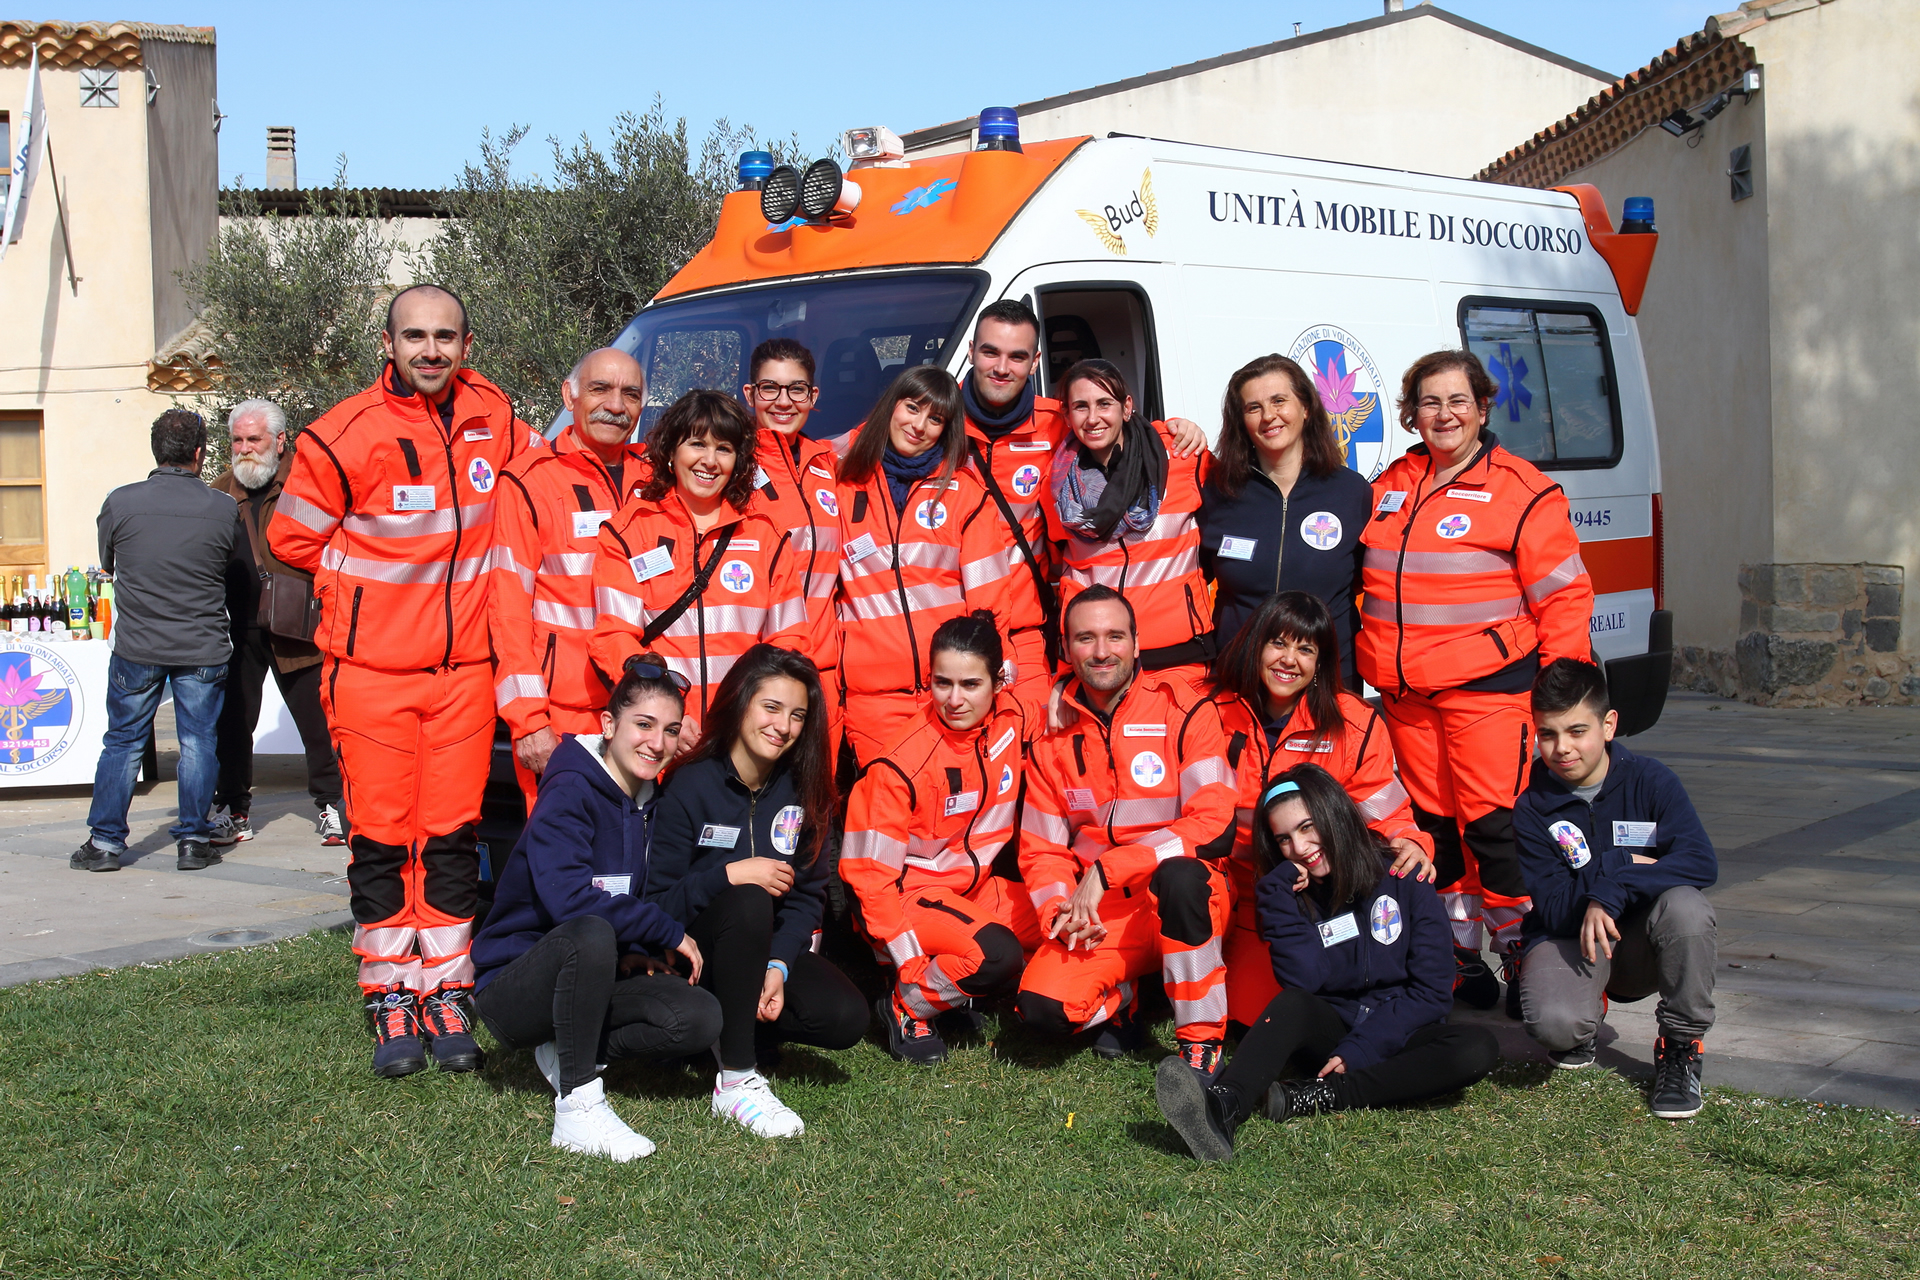 Monreal Soccorso, inaugurata la nuova ambulanza